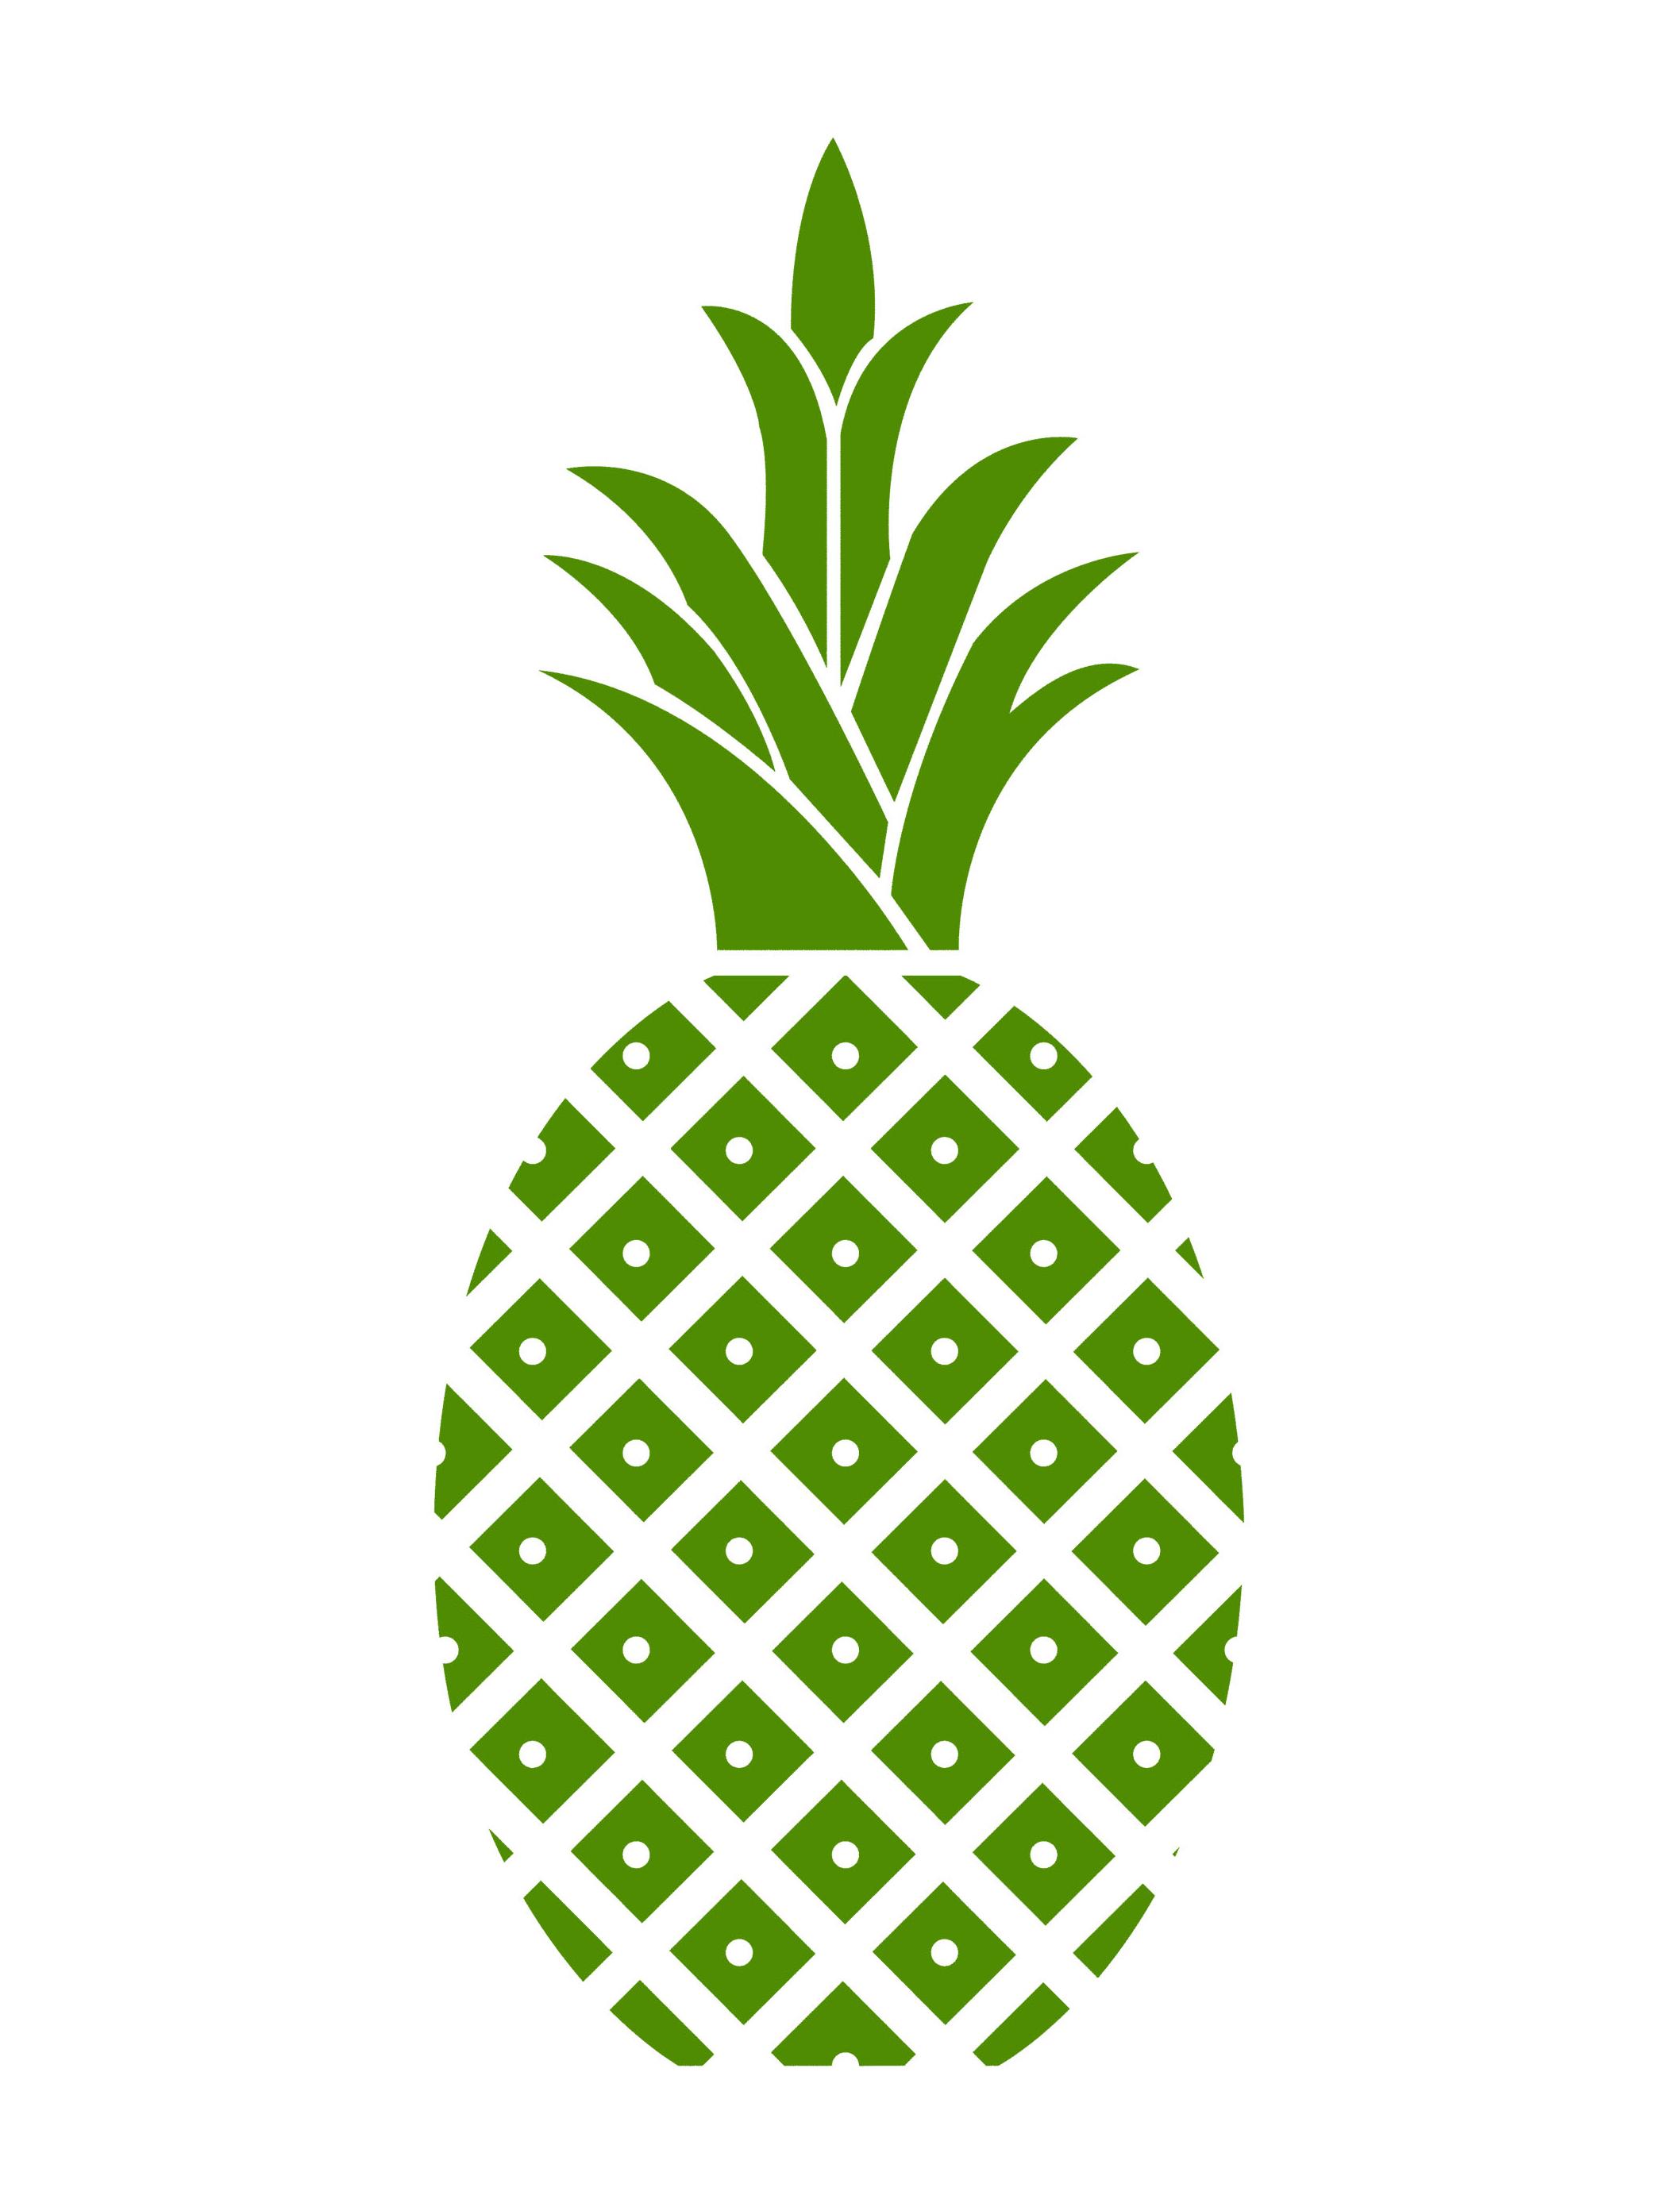 Pineapple clipart logo. Hospitality panda free images